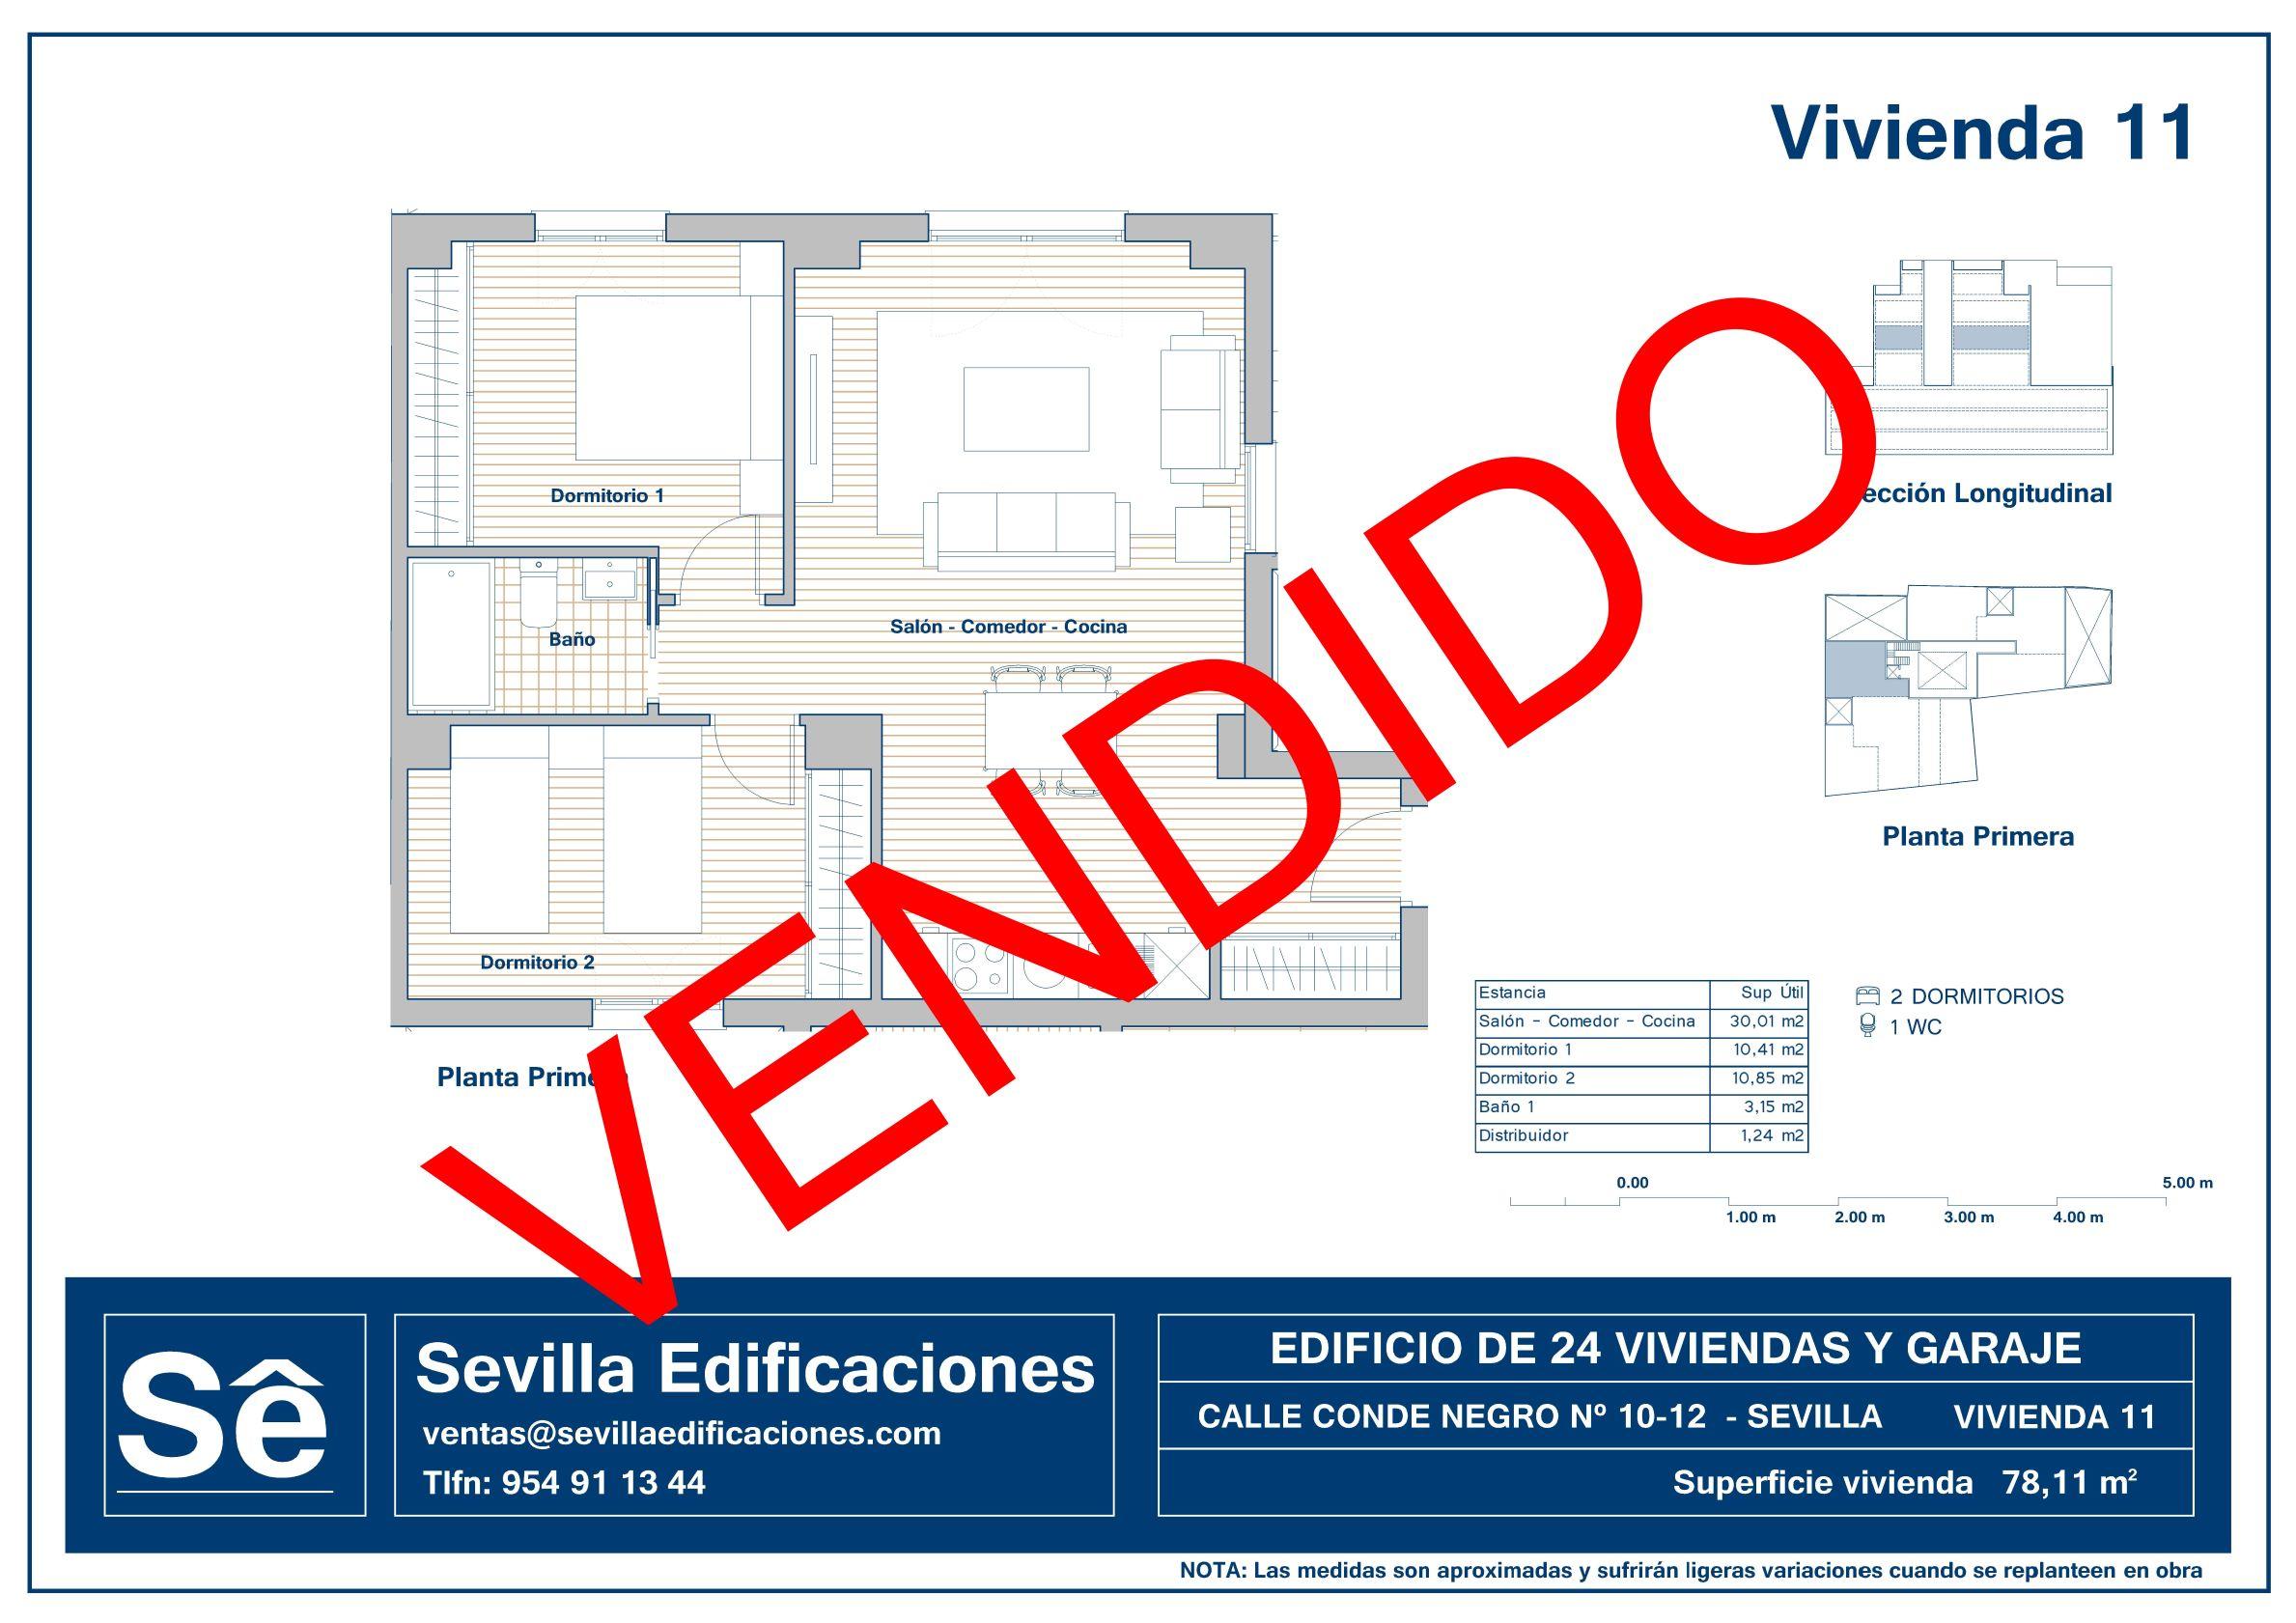 CONDENEGRO_VIVIENDA_11_VENDIDO